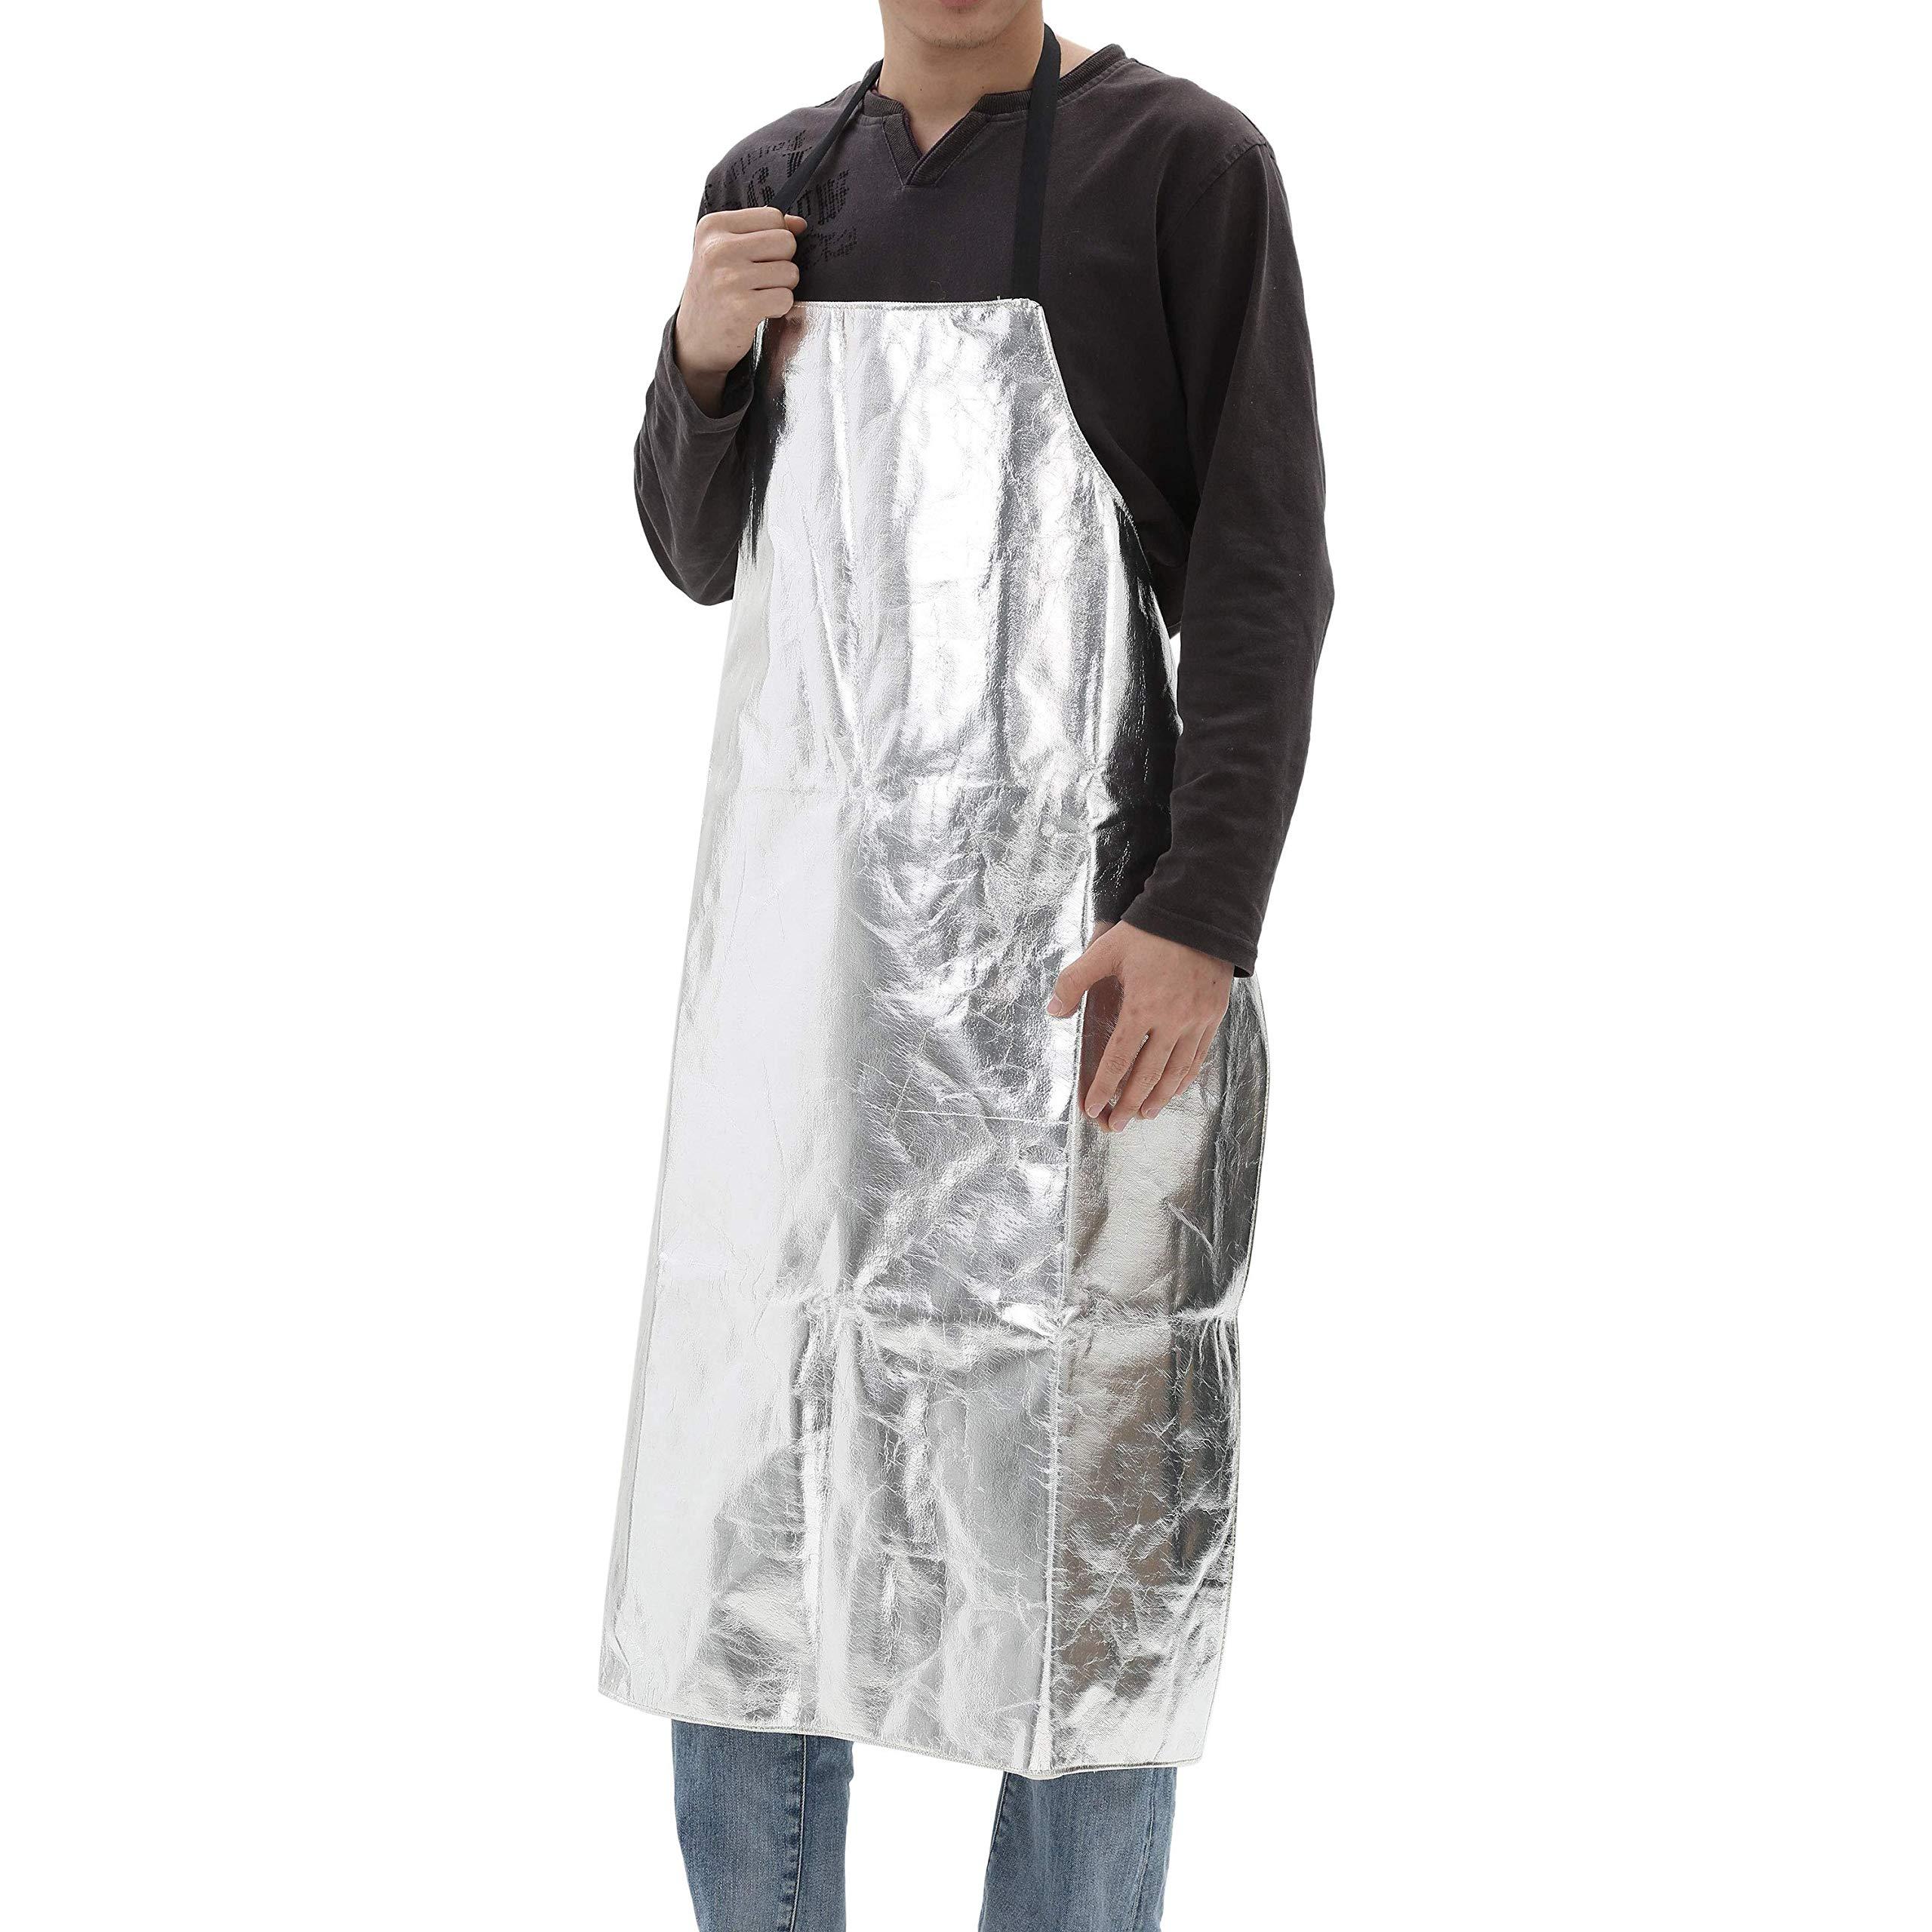 Mufly Apron Bib Style Aluminized Heat Resistant Apron Flame Resistant Apparel Safety Coat Splash Proof Aluminized